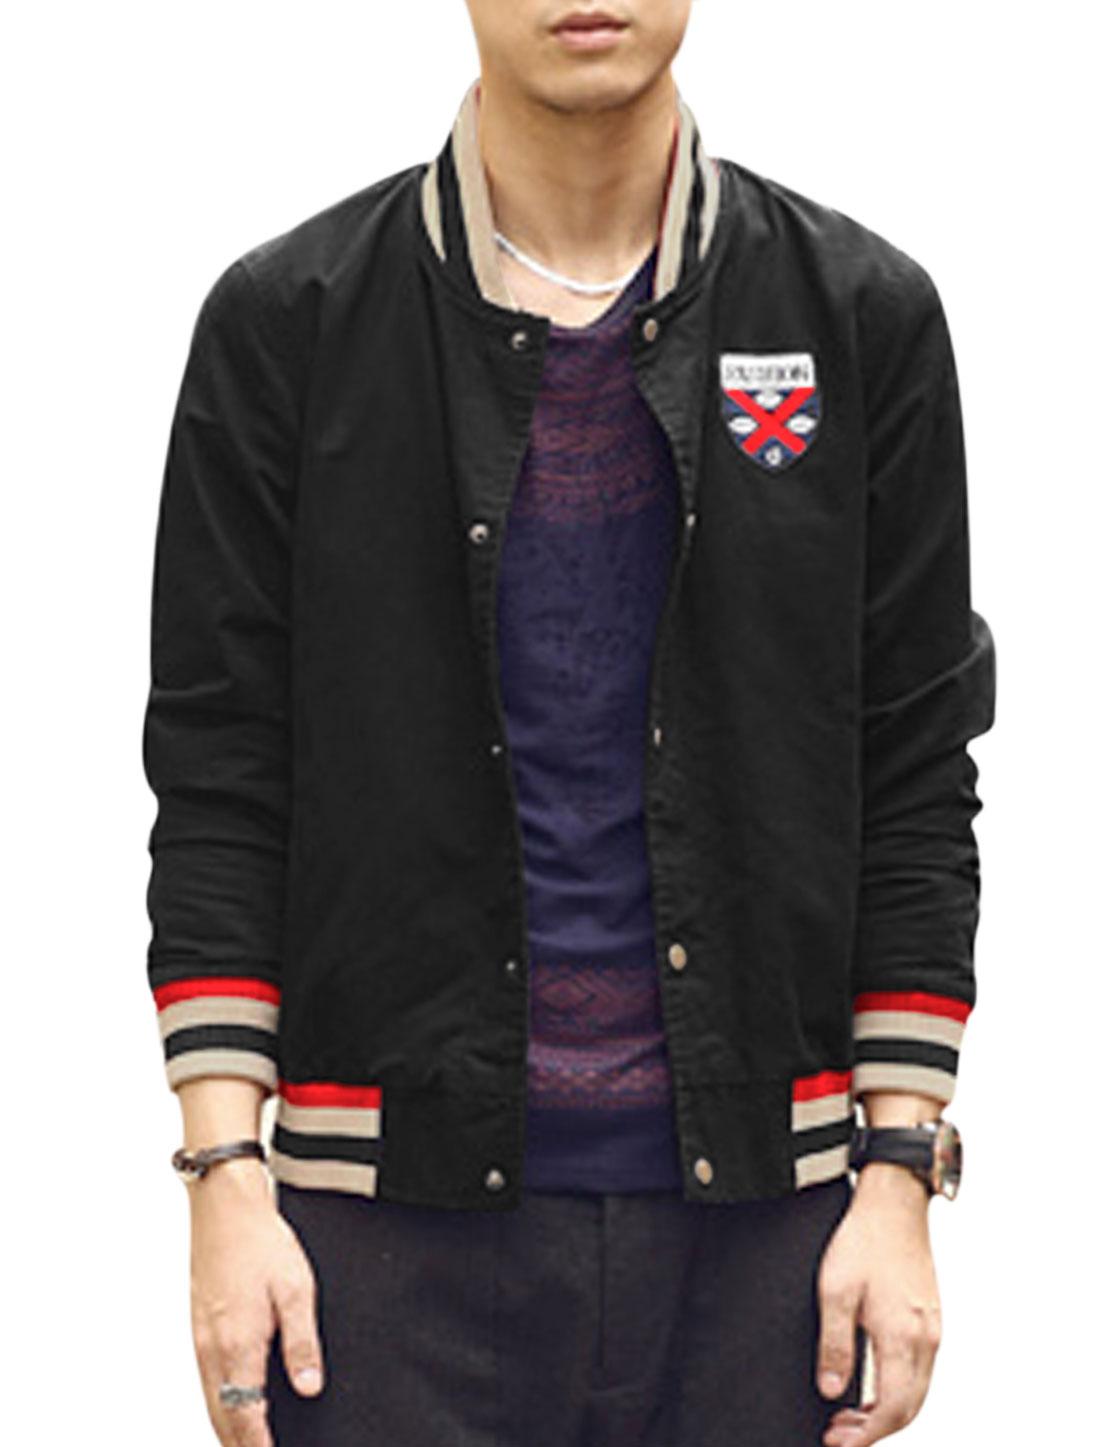 Men Rib Knit Collar Slant Pockets Badge Applique Casual Canvas Jacket Black M